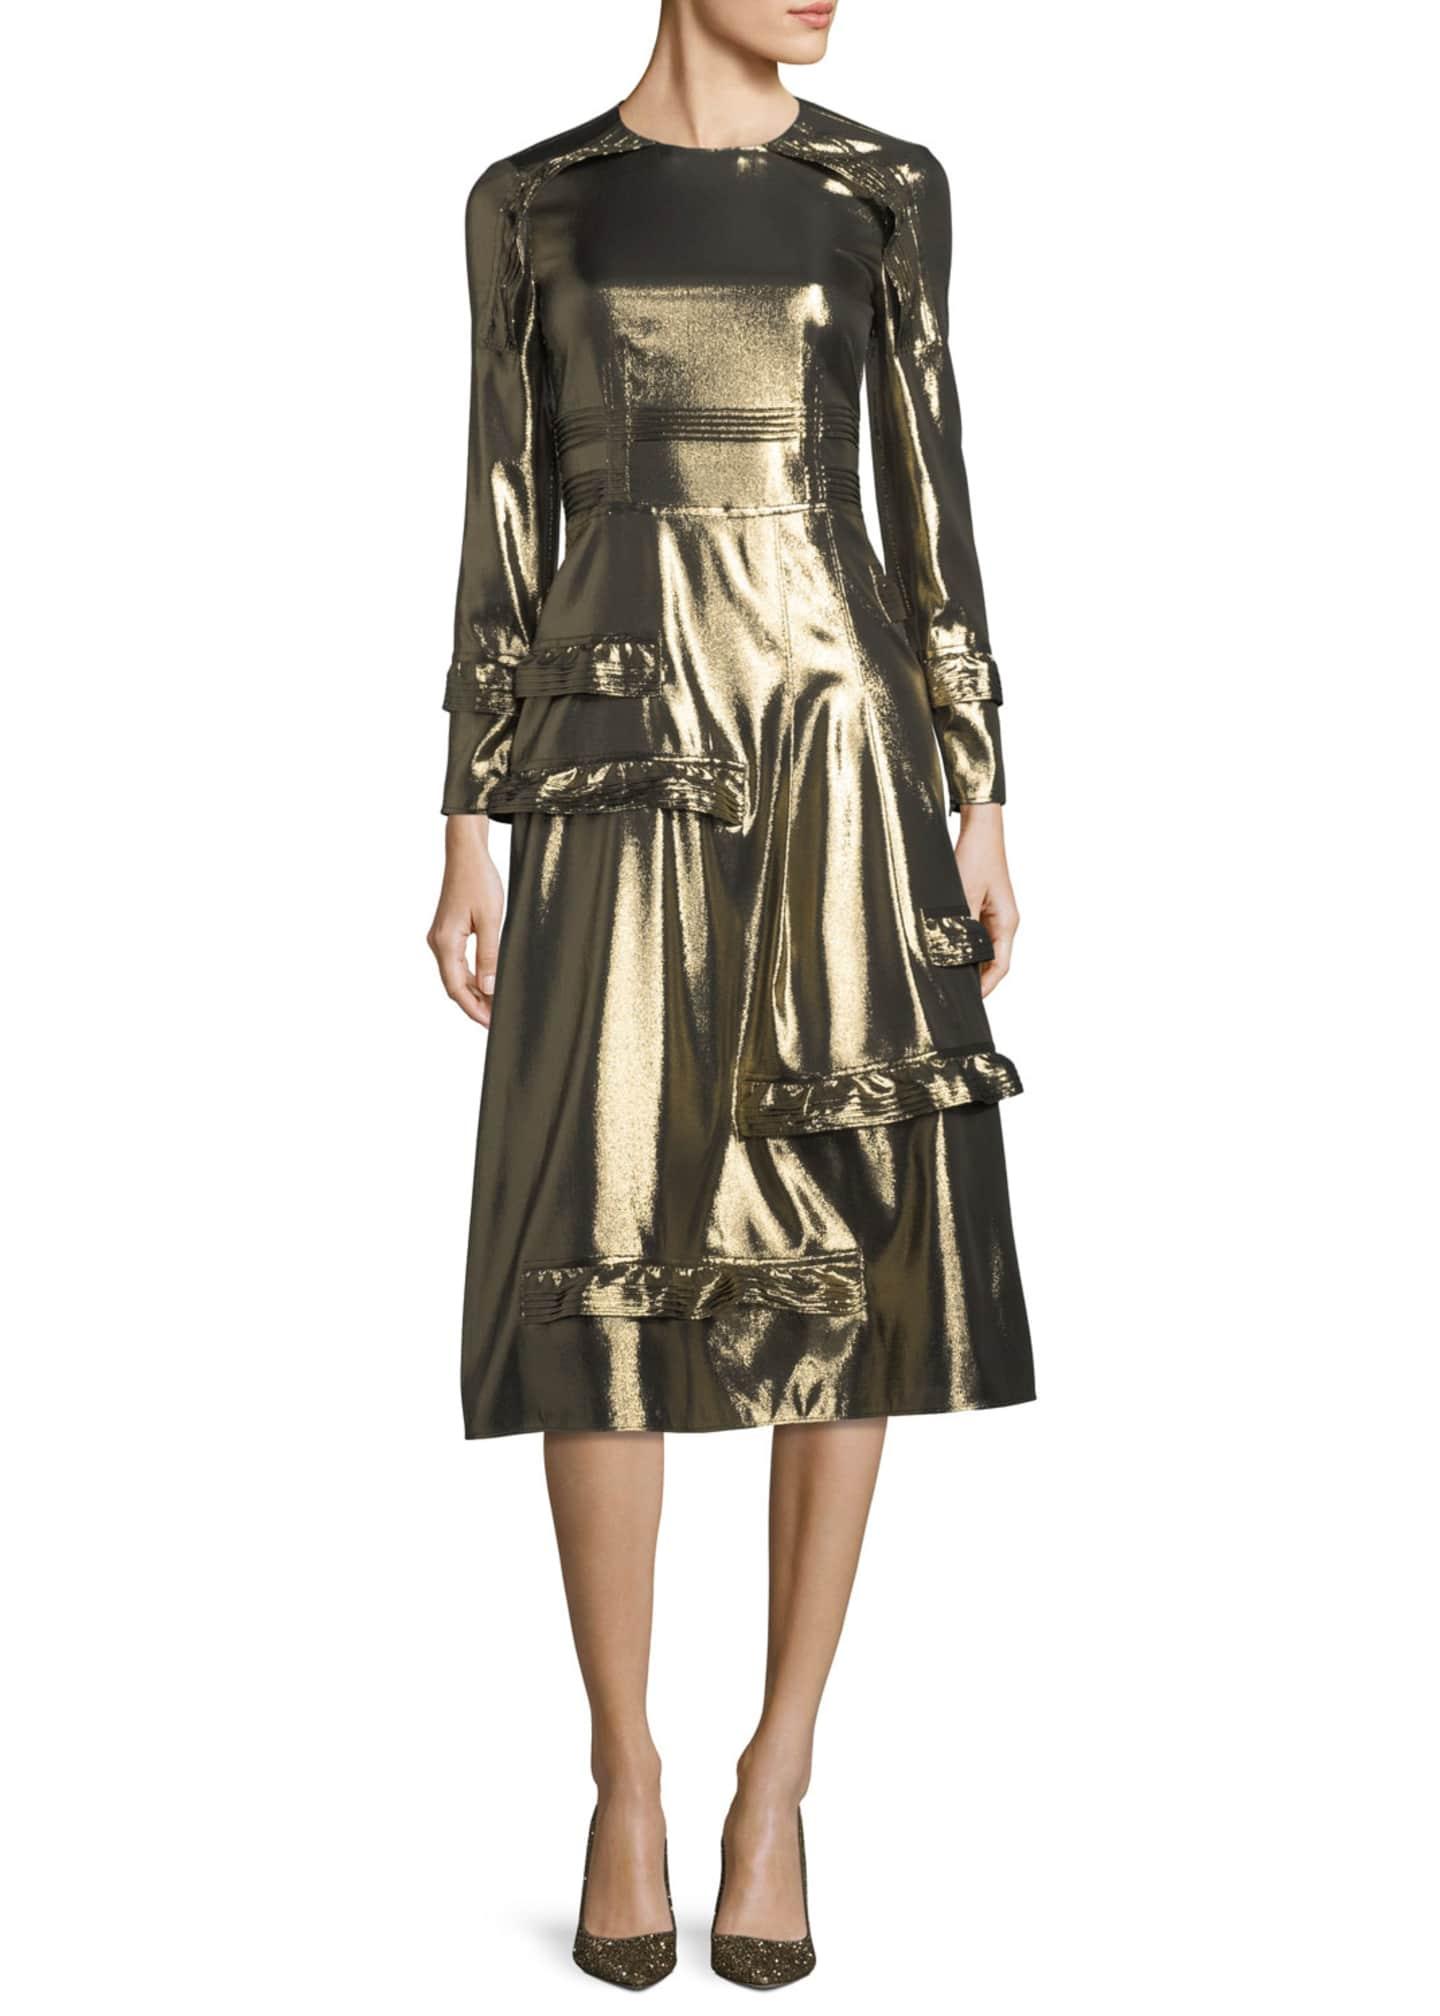 Burberry Long-Sleeve Metallic Ruffle-Trim Dress